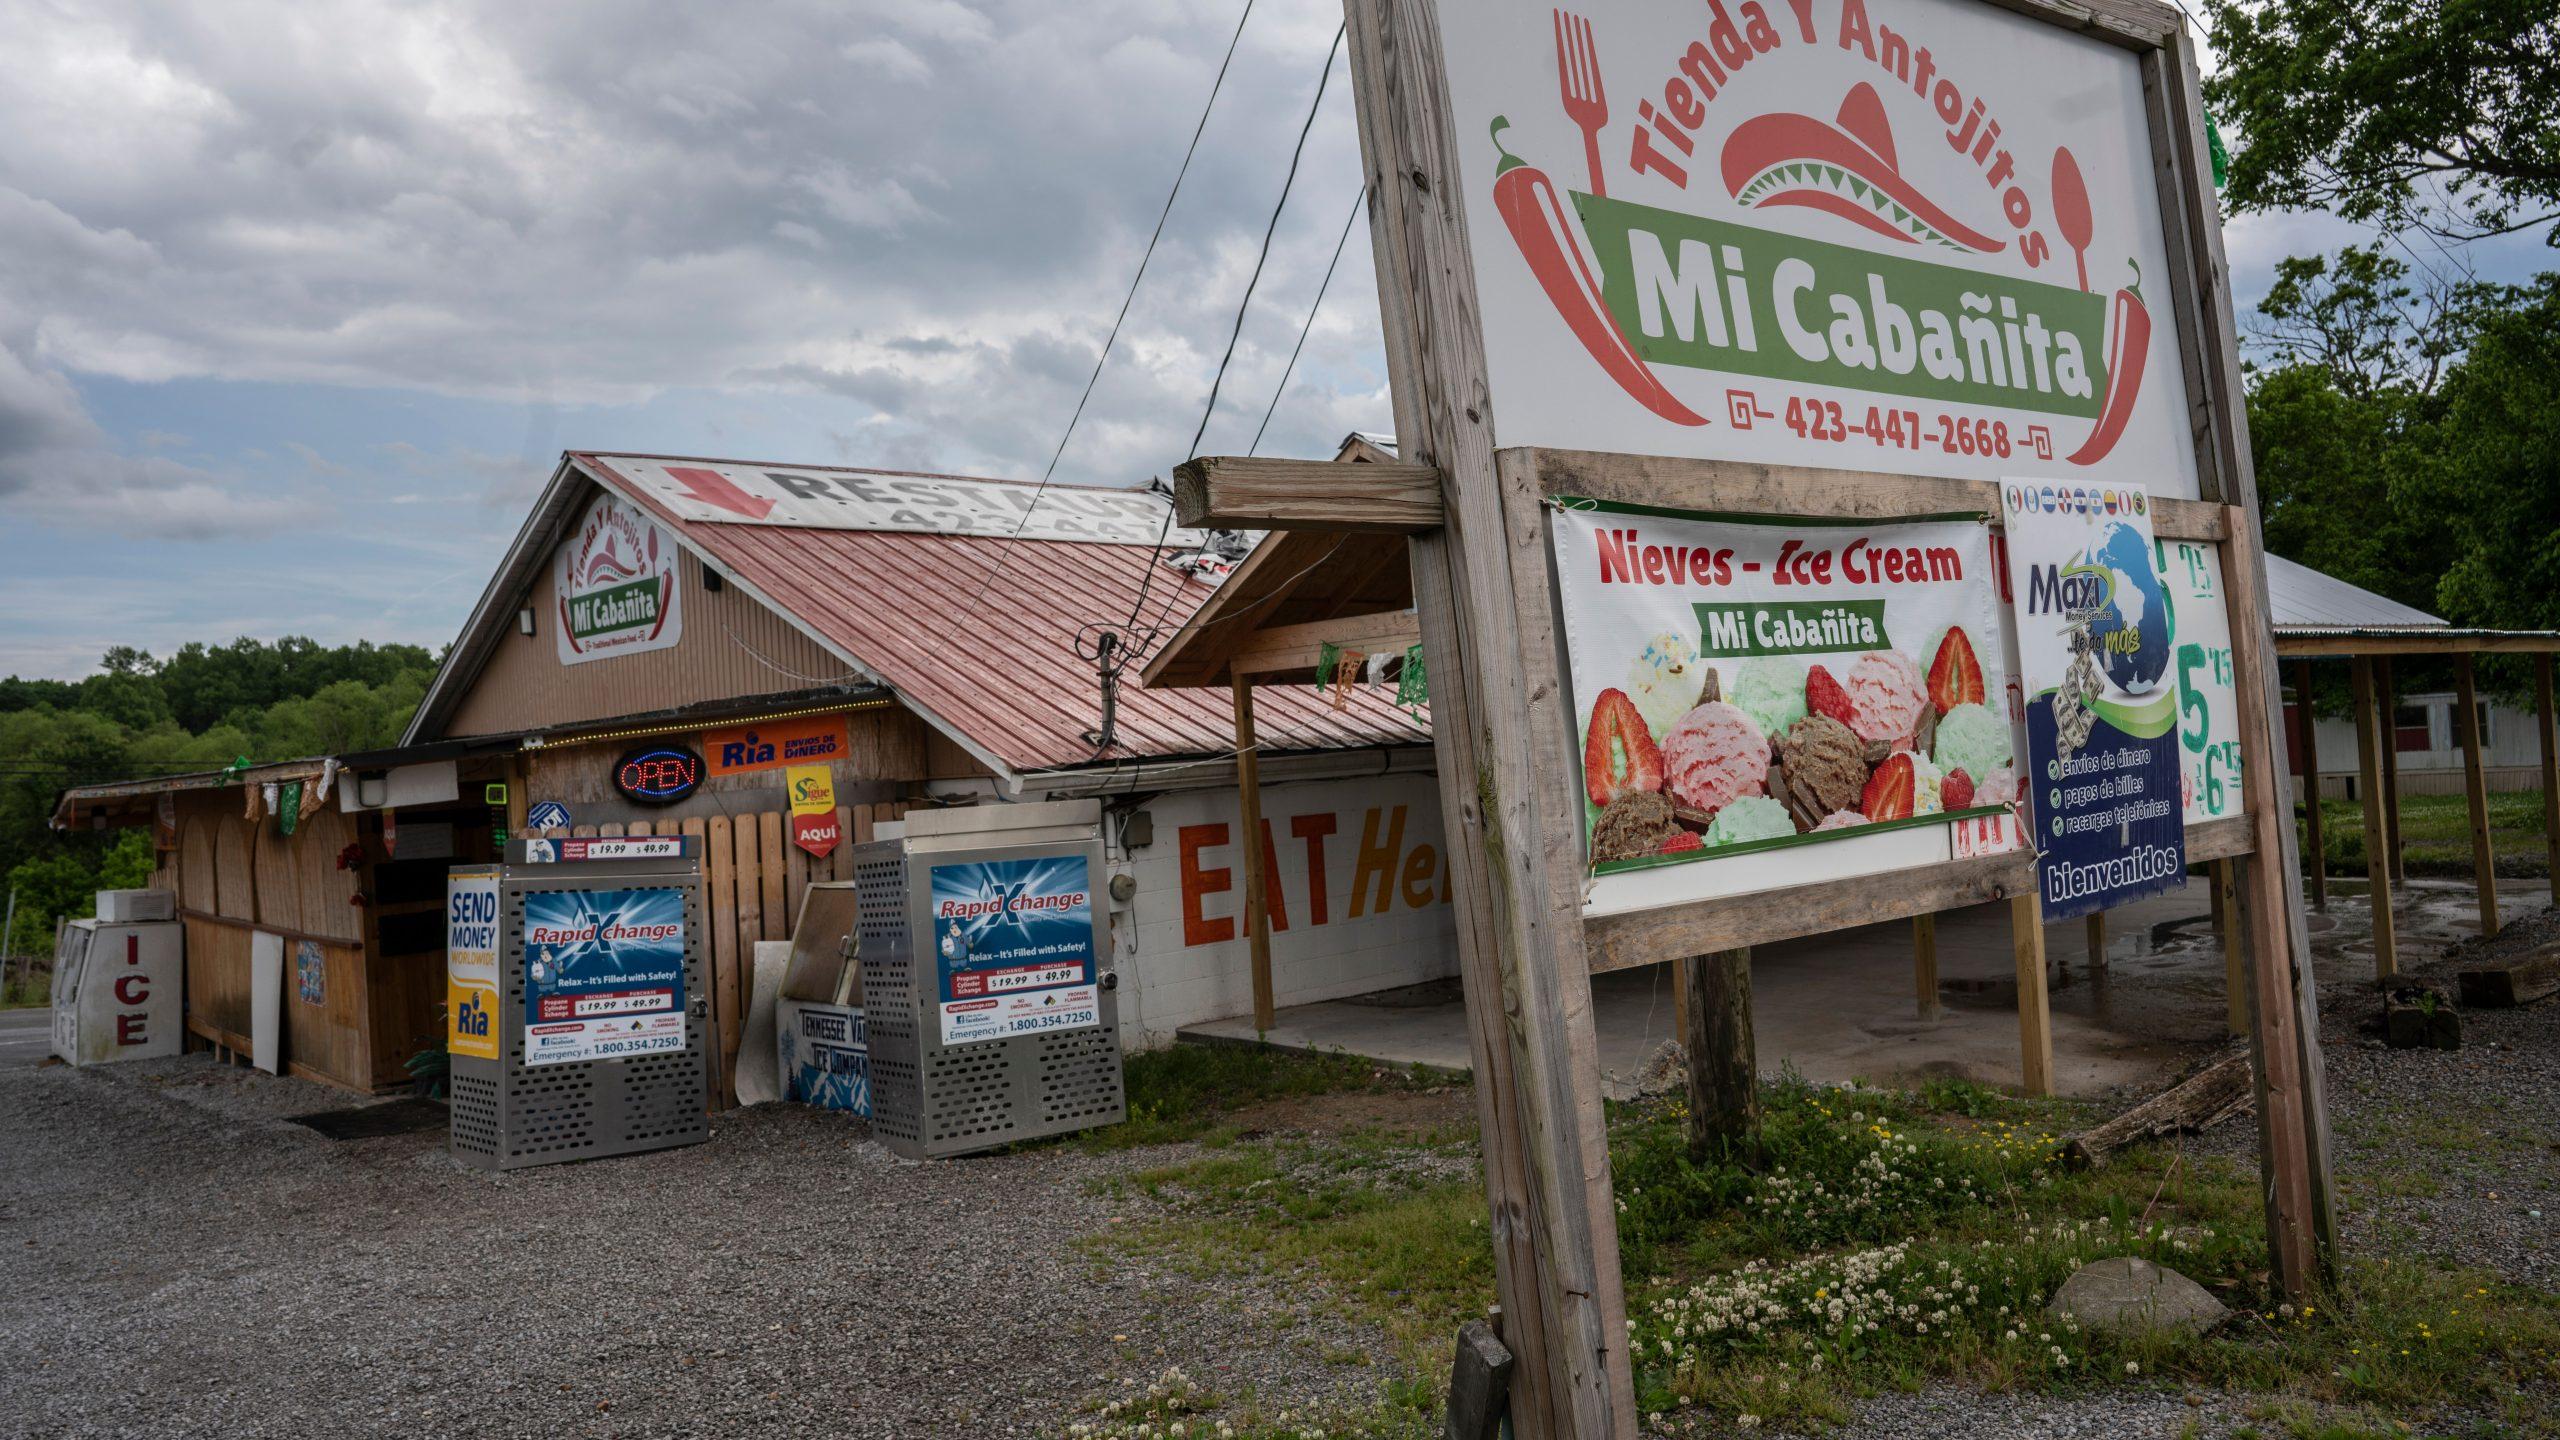 Mi Cabanita, a Rhea County Hispanic grocery and restaurant. (Photo: John Partipilo)